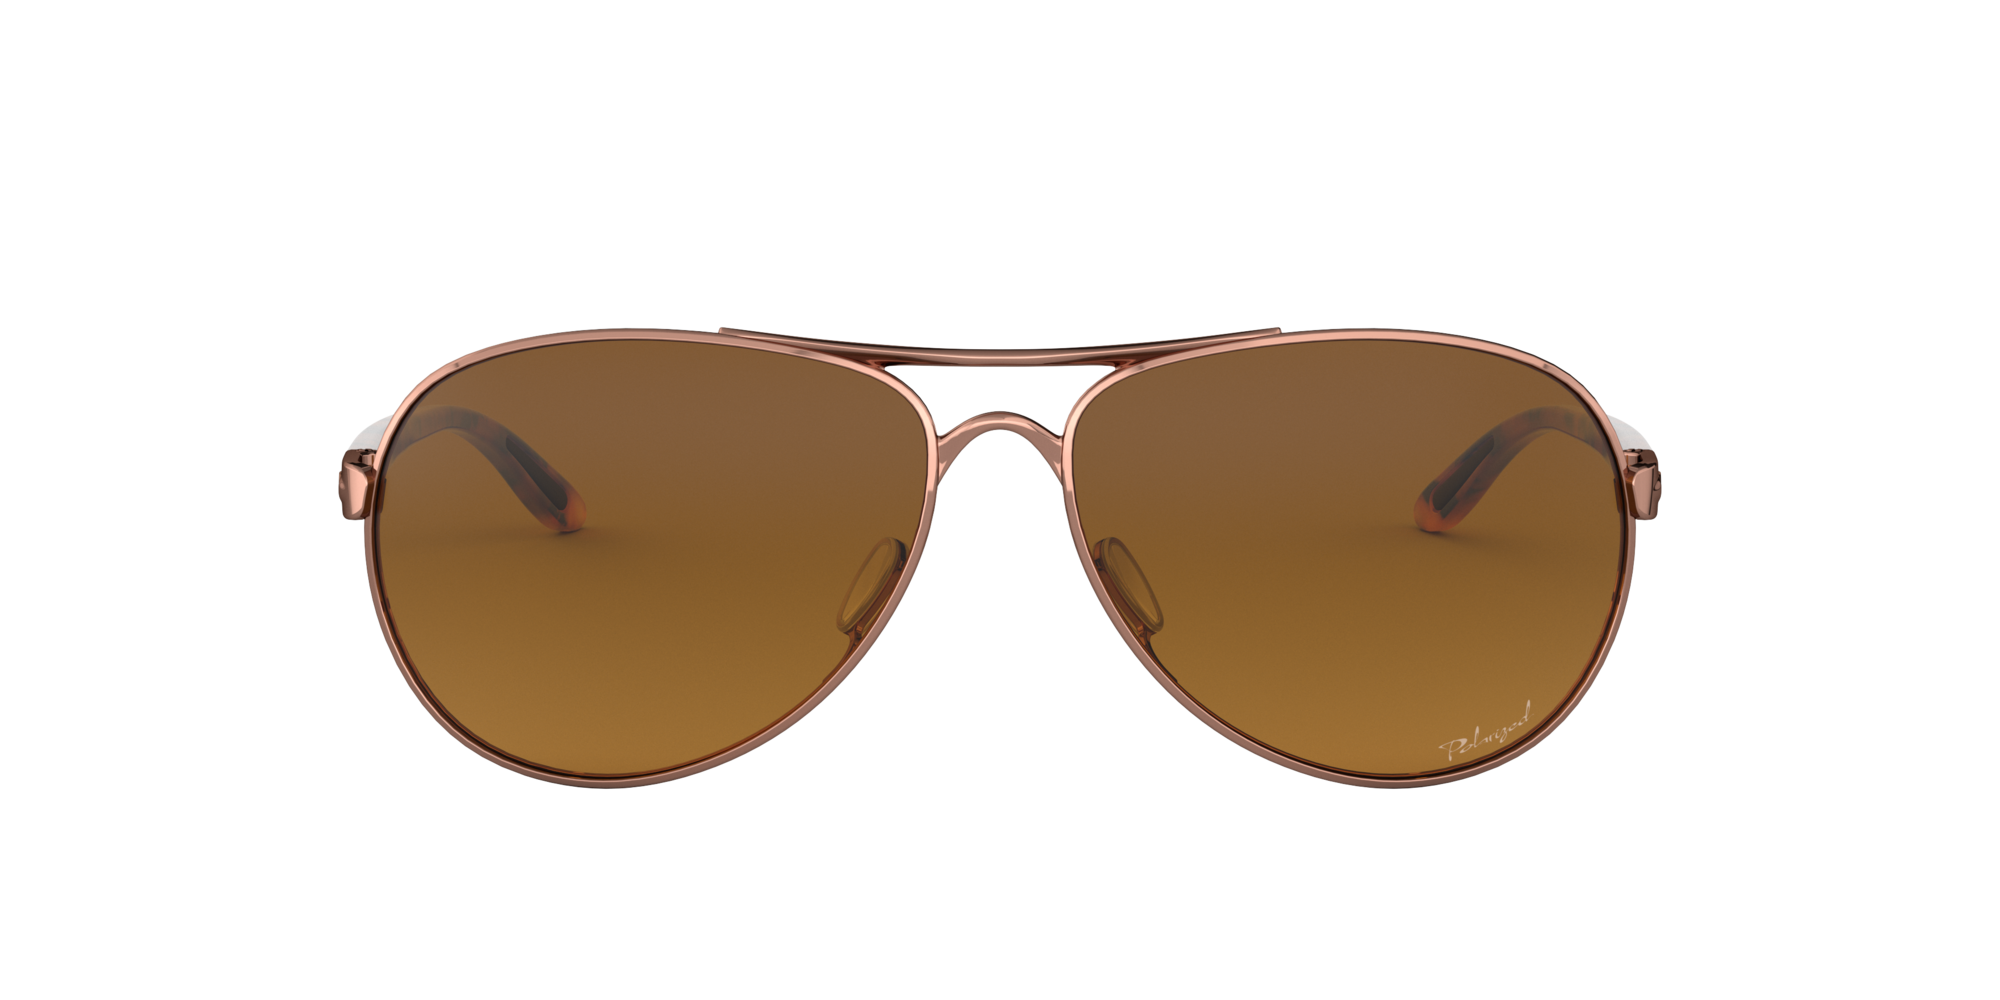 Image for OO4079 59 FEEDBACK from LensCrafters | Glasses, Prescription Glasses Online, Eyewear